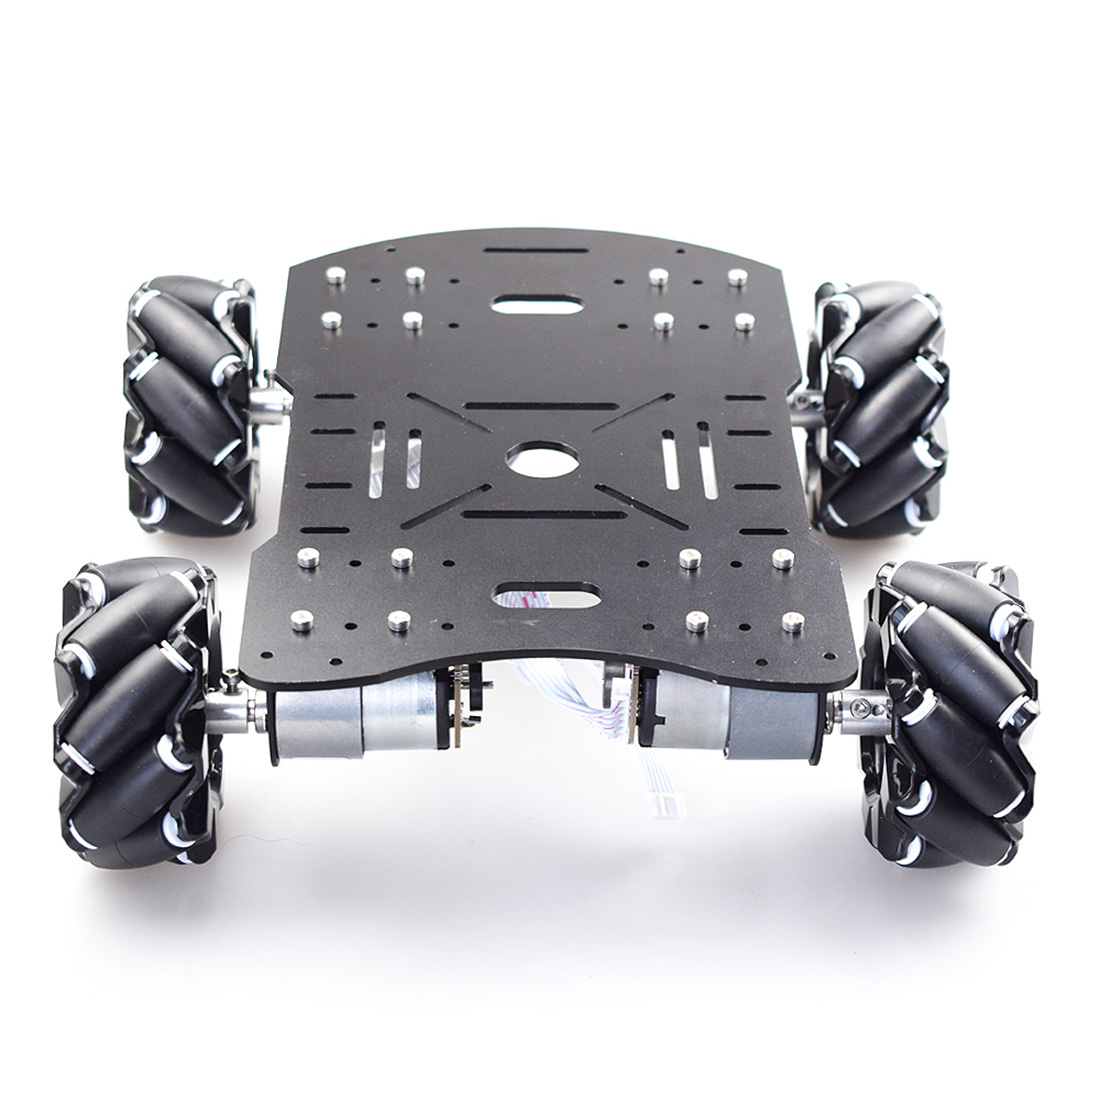 80mm Mecanum Acrylic Platform Kit Omni-Directional Mecanum Wheel Robot Car With STM32 Electronic Control (Without Power Supply)